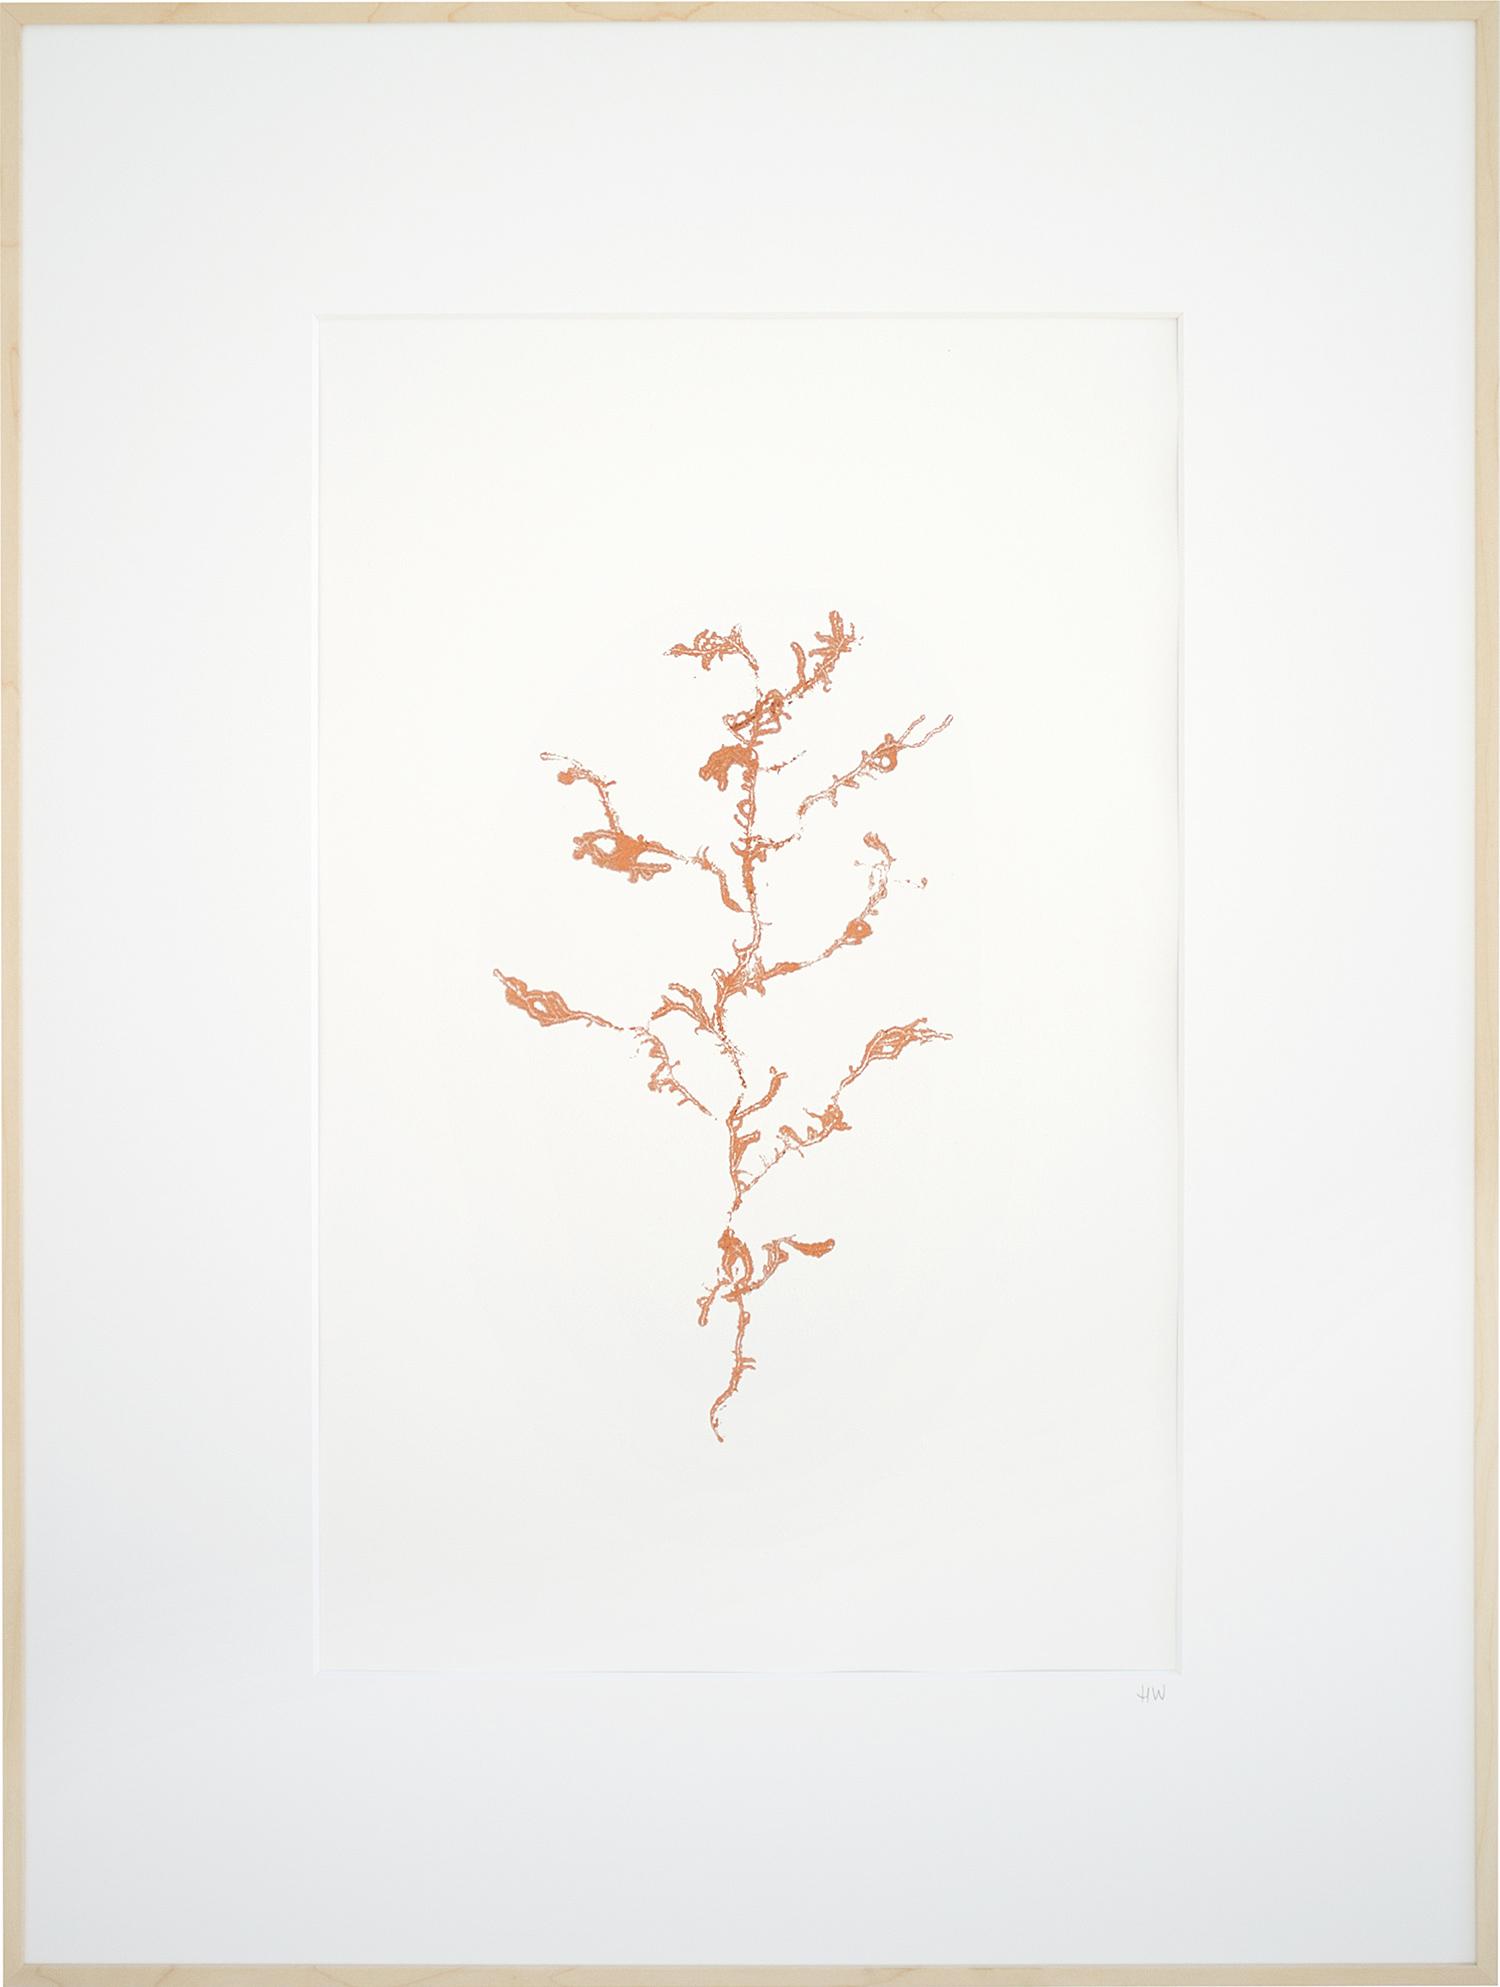 Encyclopedia-of-newfound-plants-16.jpg